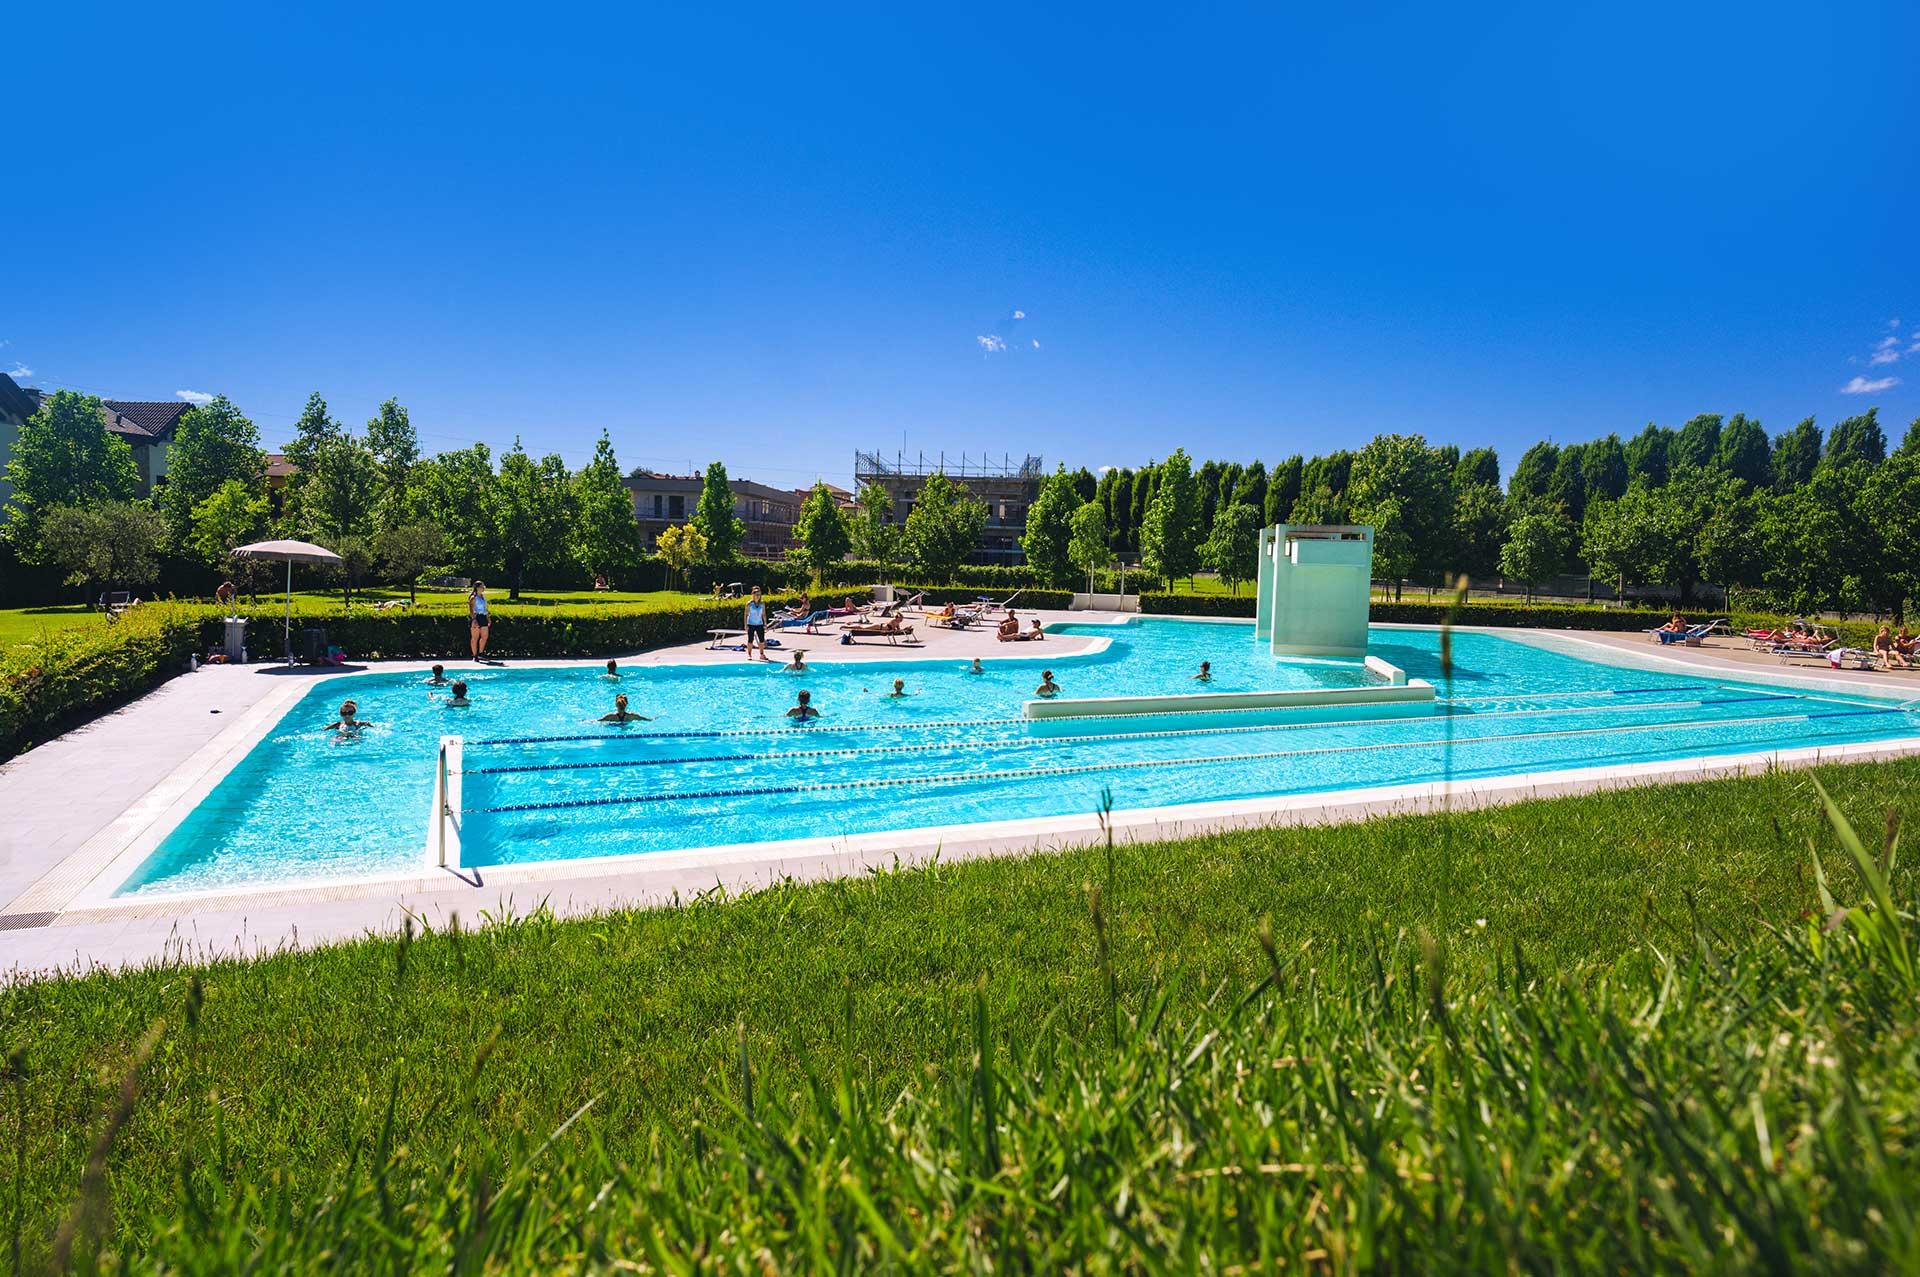 Corso in piscina estate parco Curno